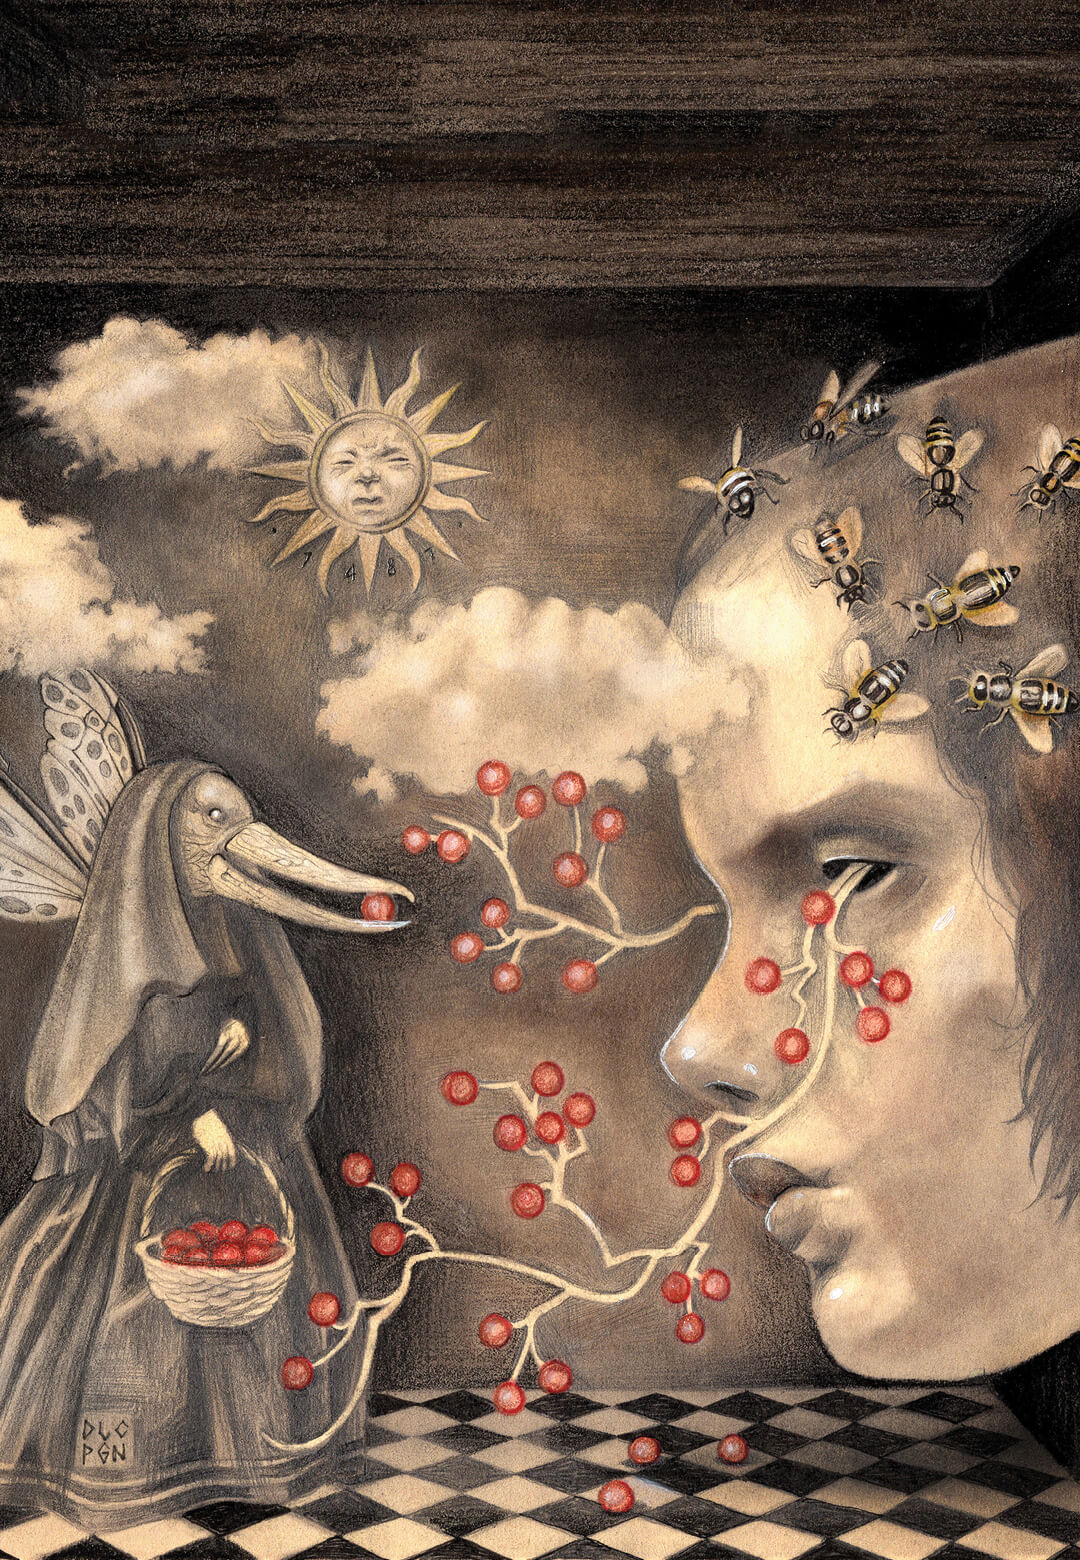 Room of tears by Ceren Aksungur| STIRworld